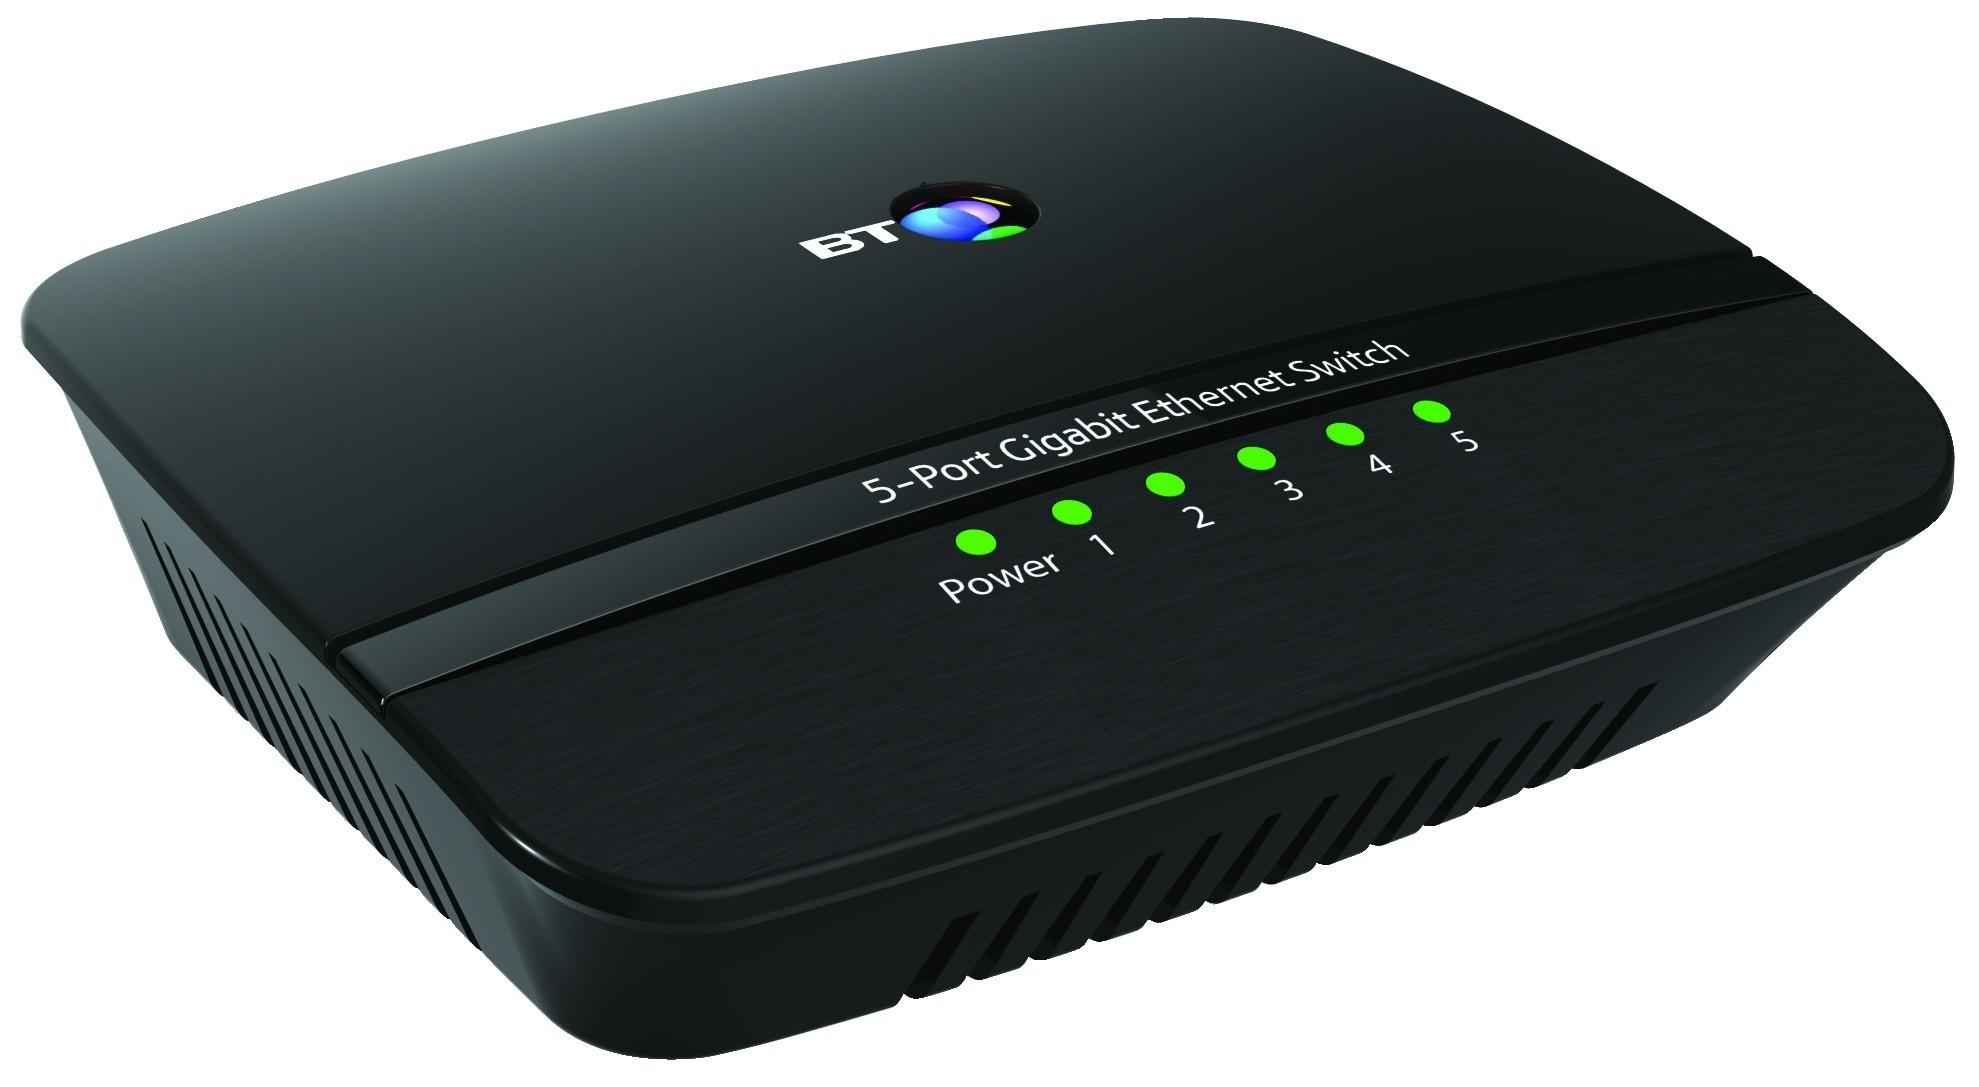 Bt Home Hub Ethernet Speeds